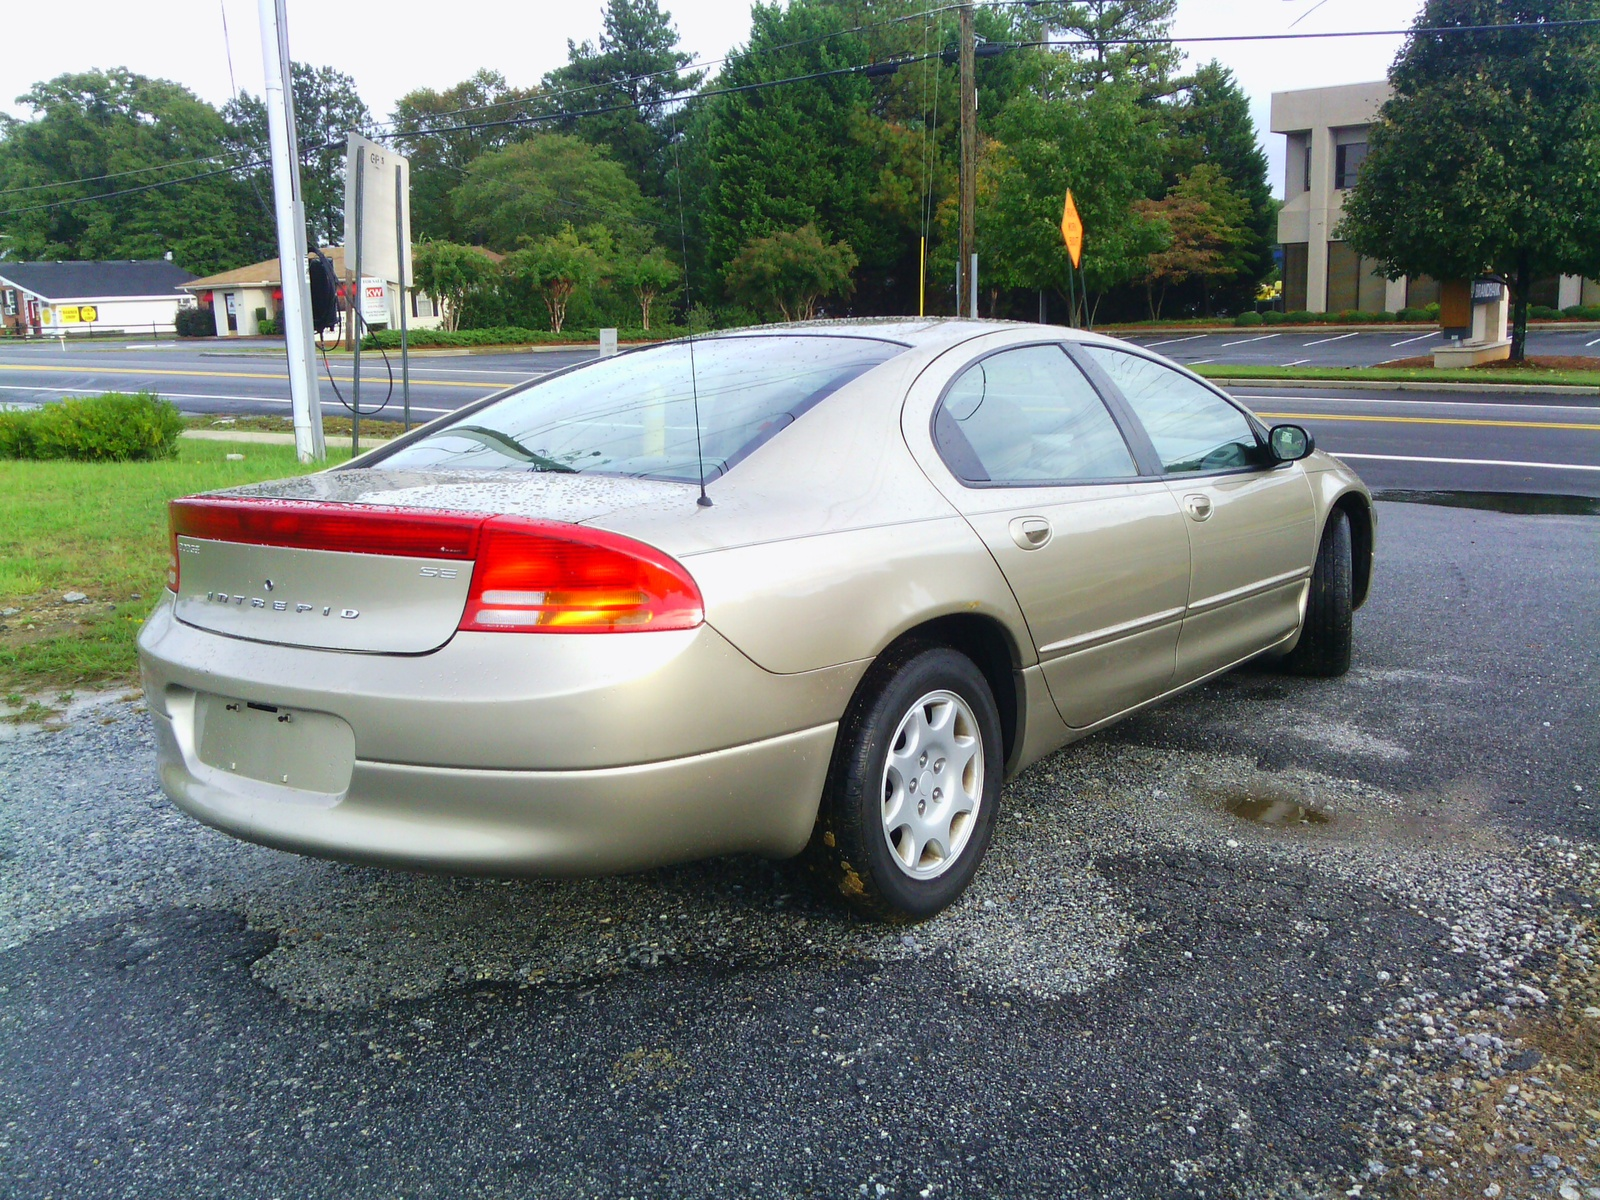 2002 Dodge Intrepid - Overview